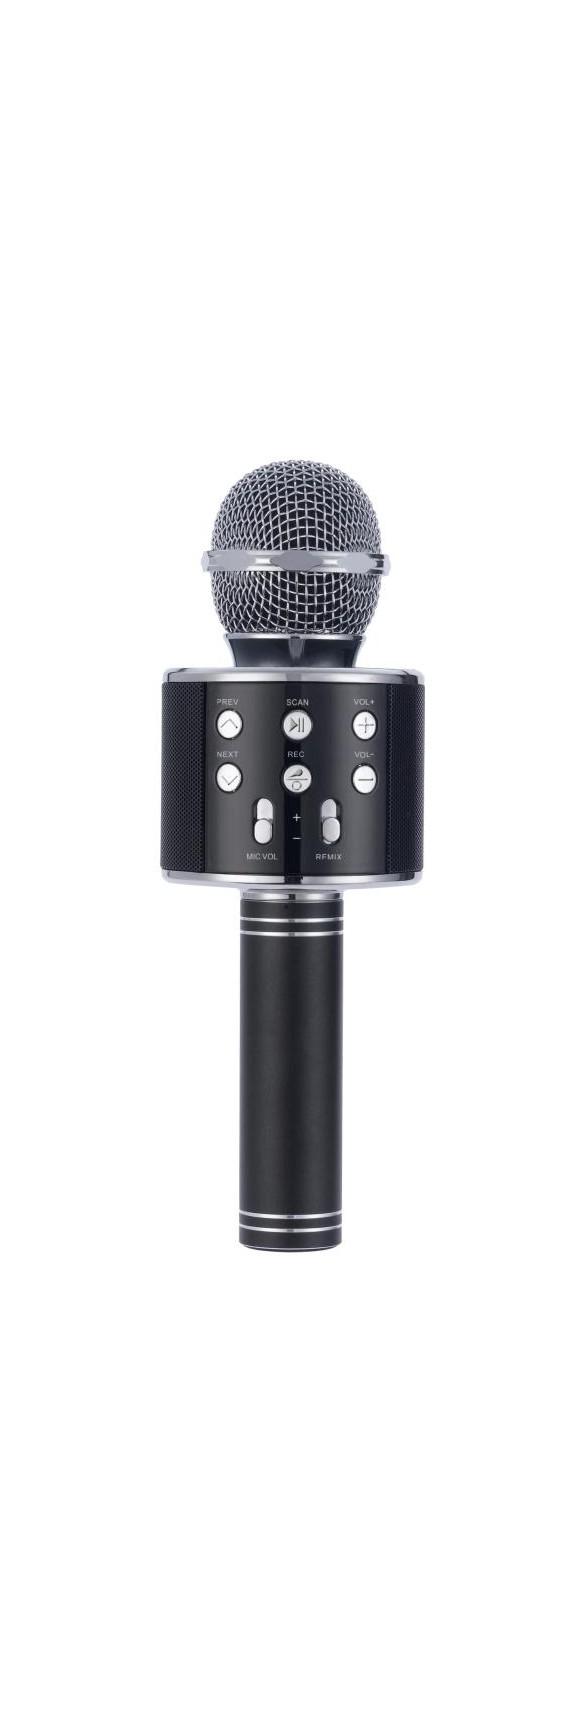 The Original VOICE Microphone - Black